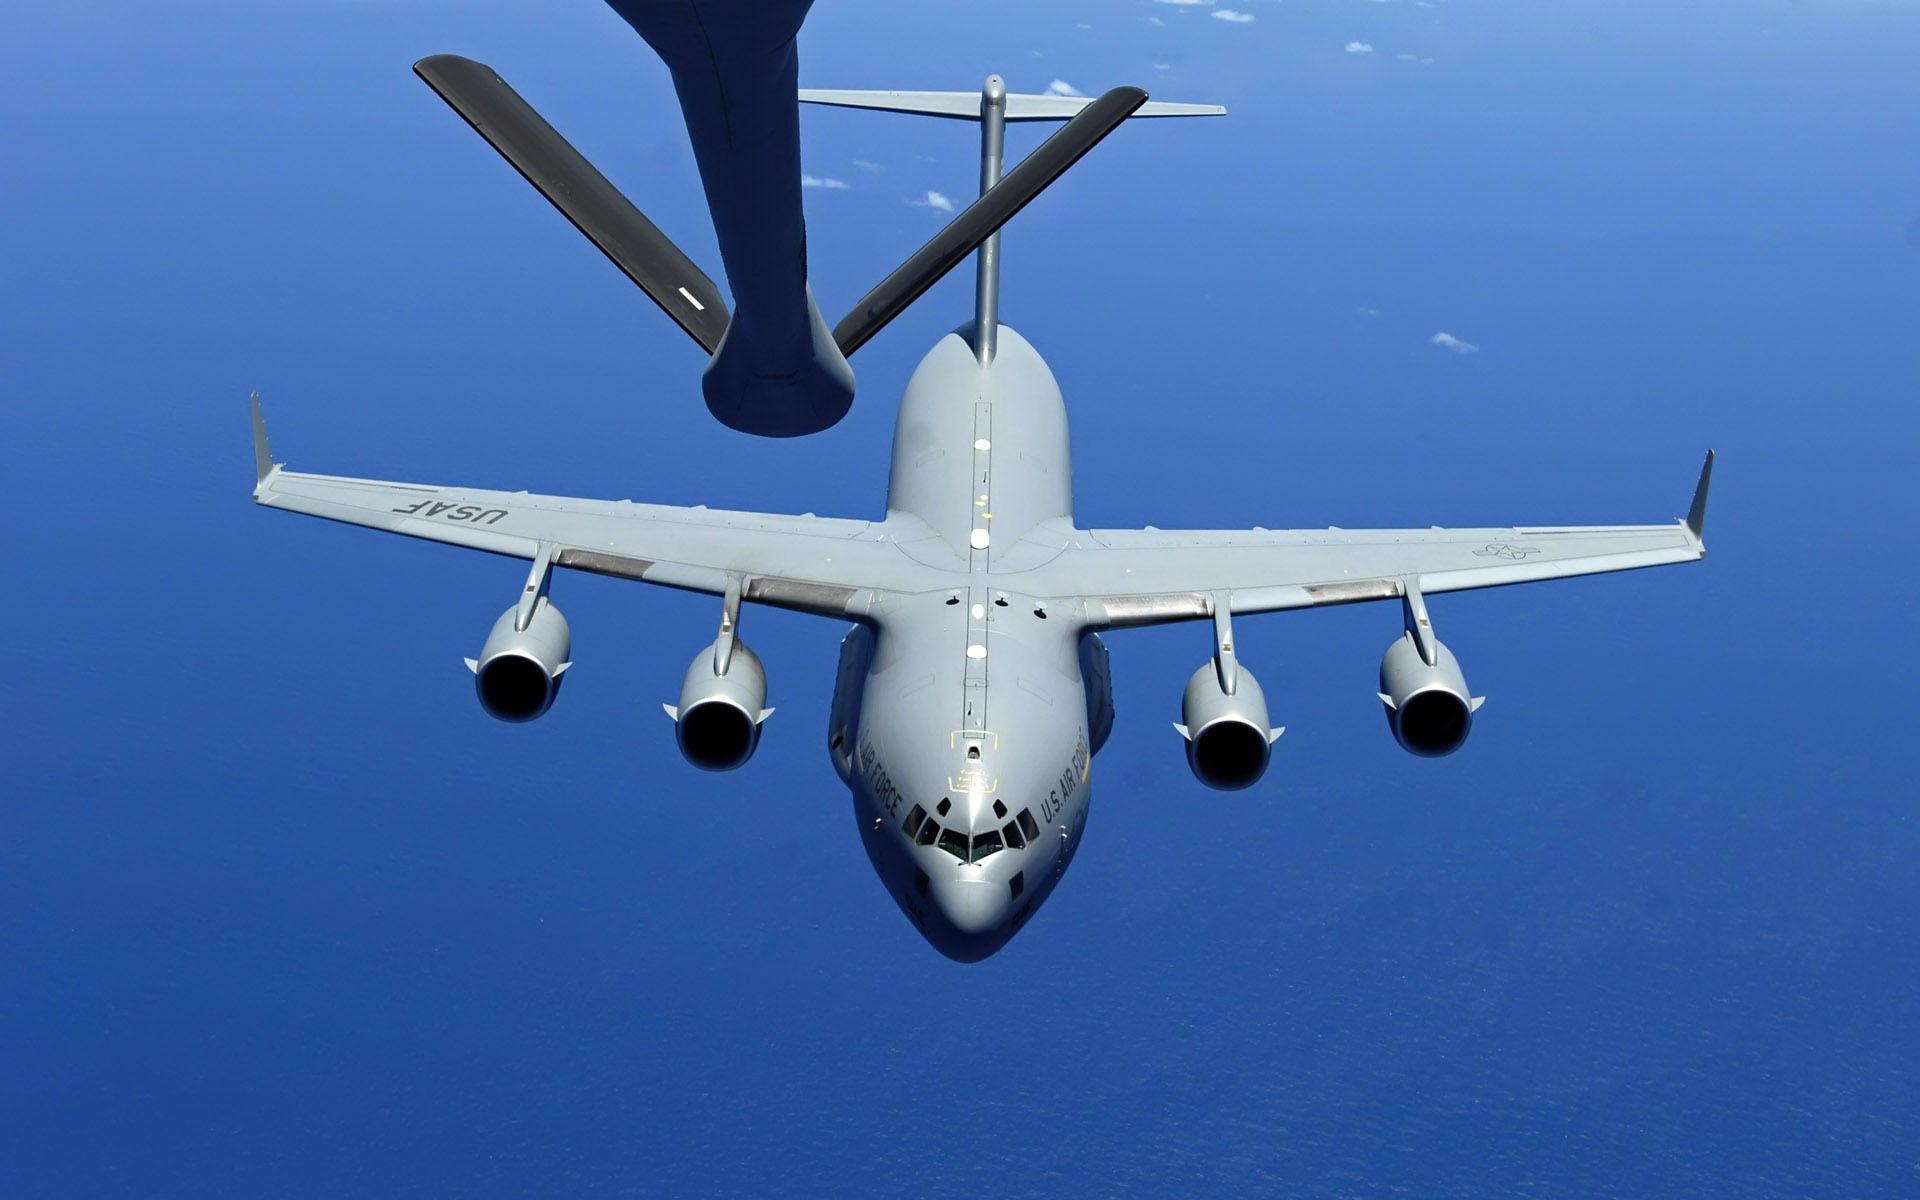 0_1495998815498_boeing-c-17-globemaster-iii-amazing-air-refueling-wallpaper-3484.jpg